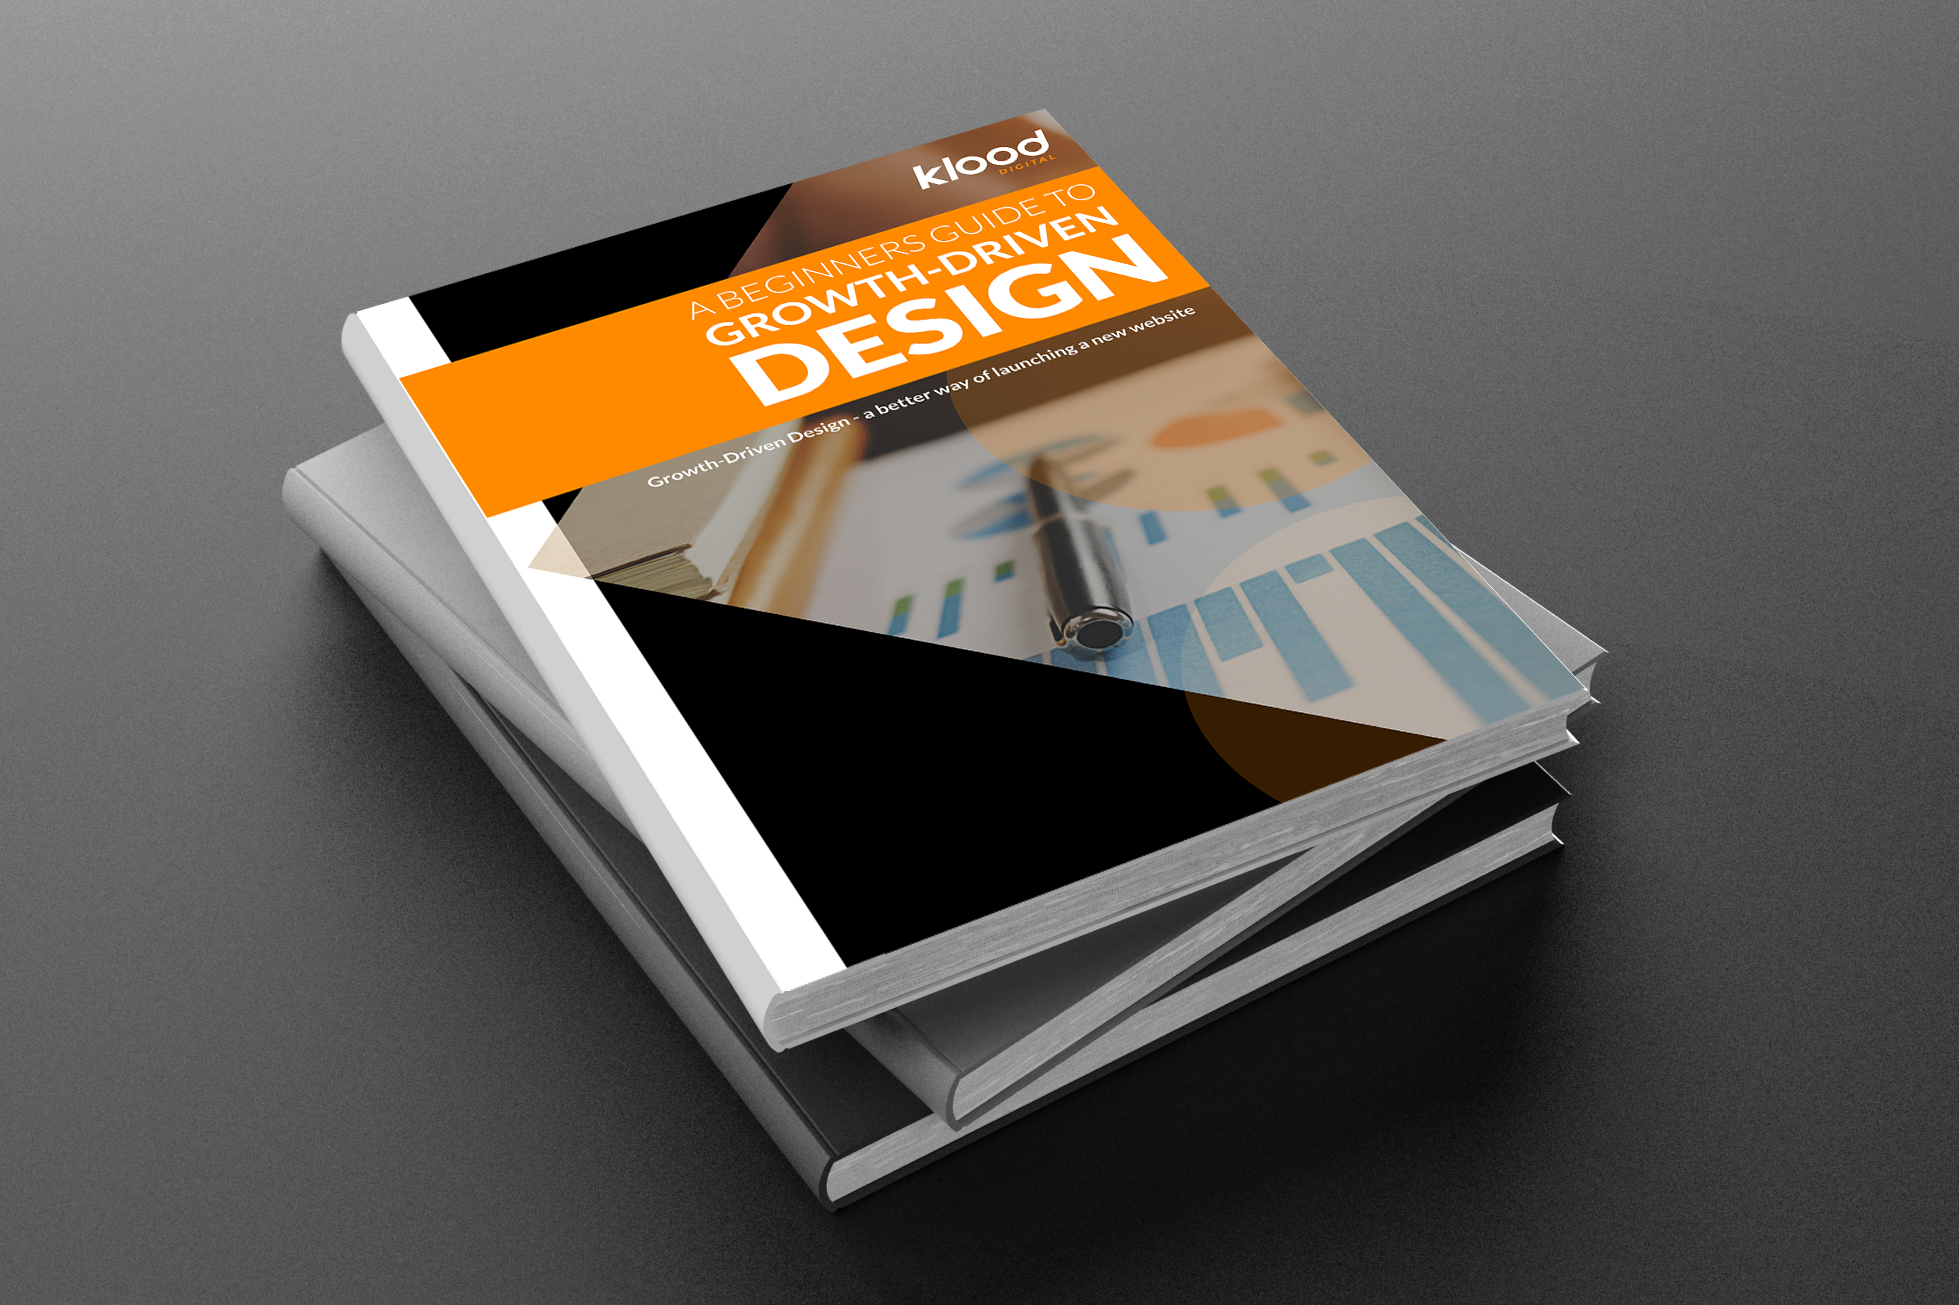 cta-growth-driven-design